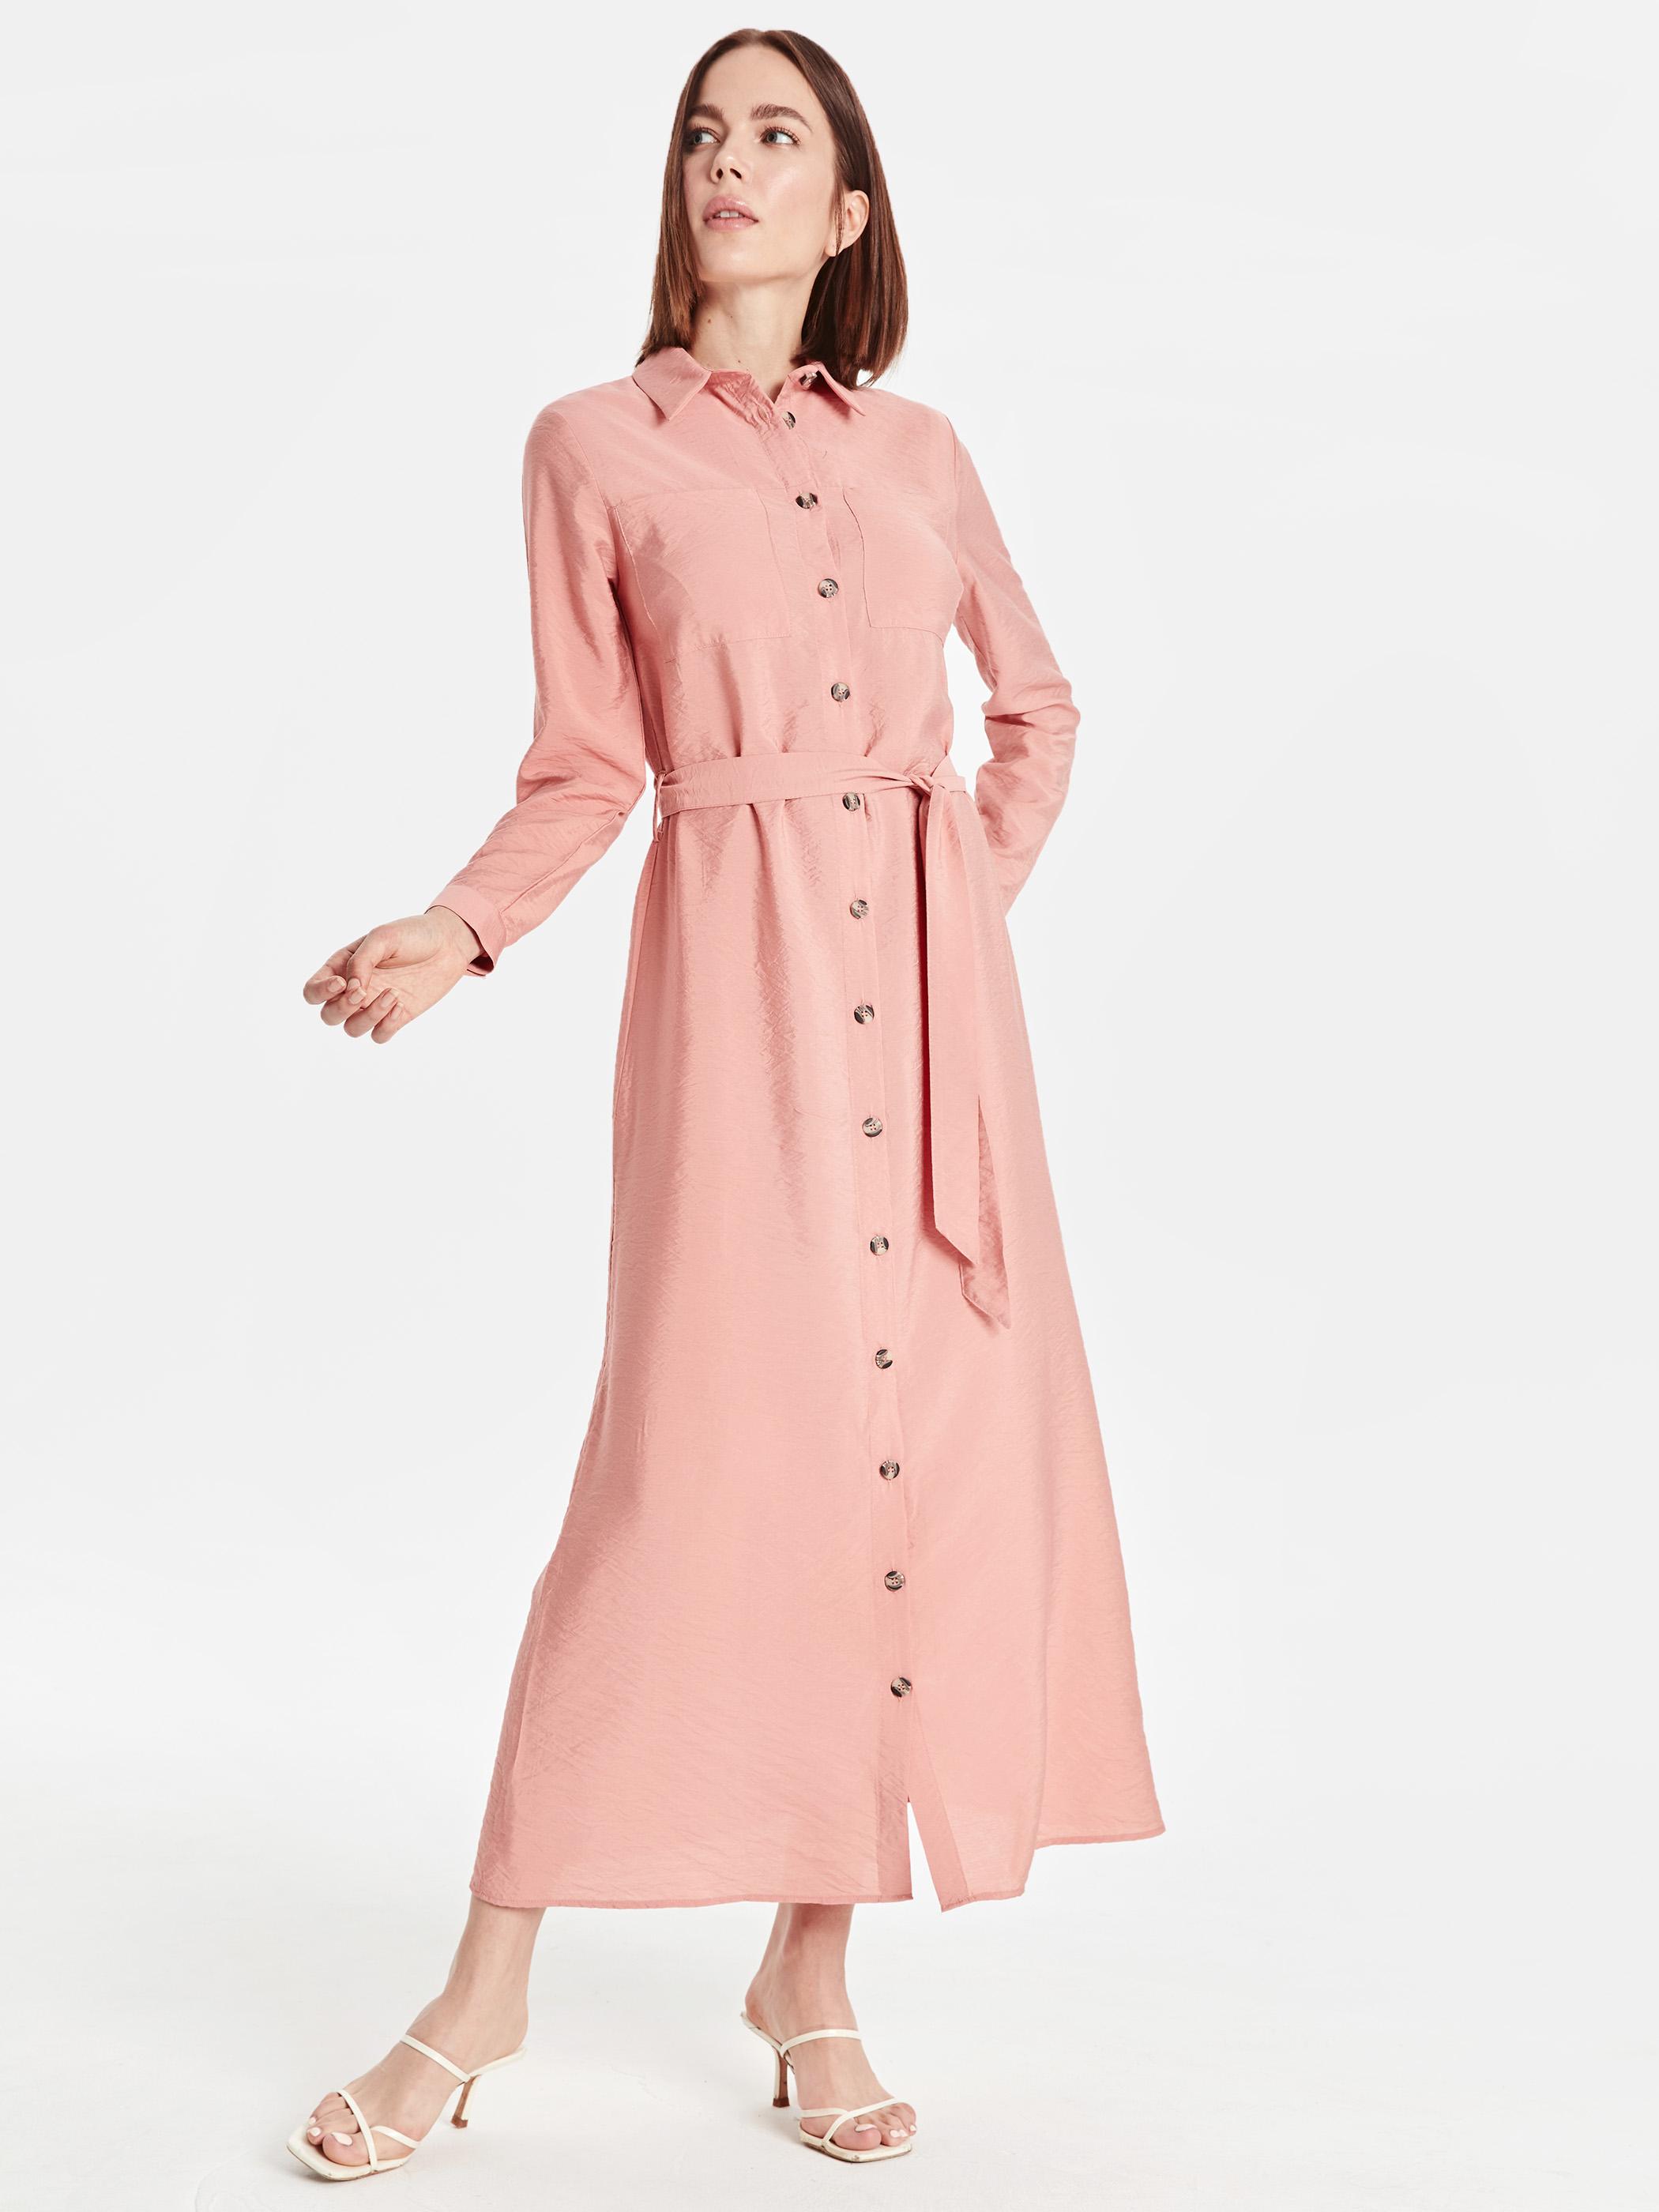 Lc waikiki tesettür elbise